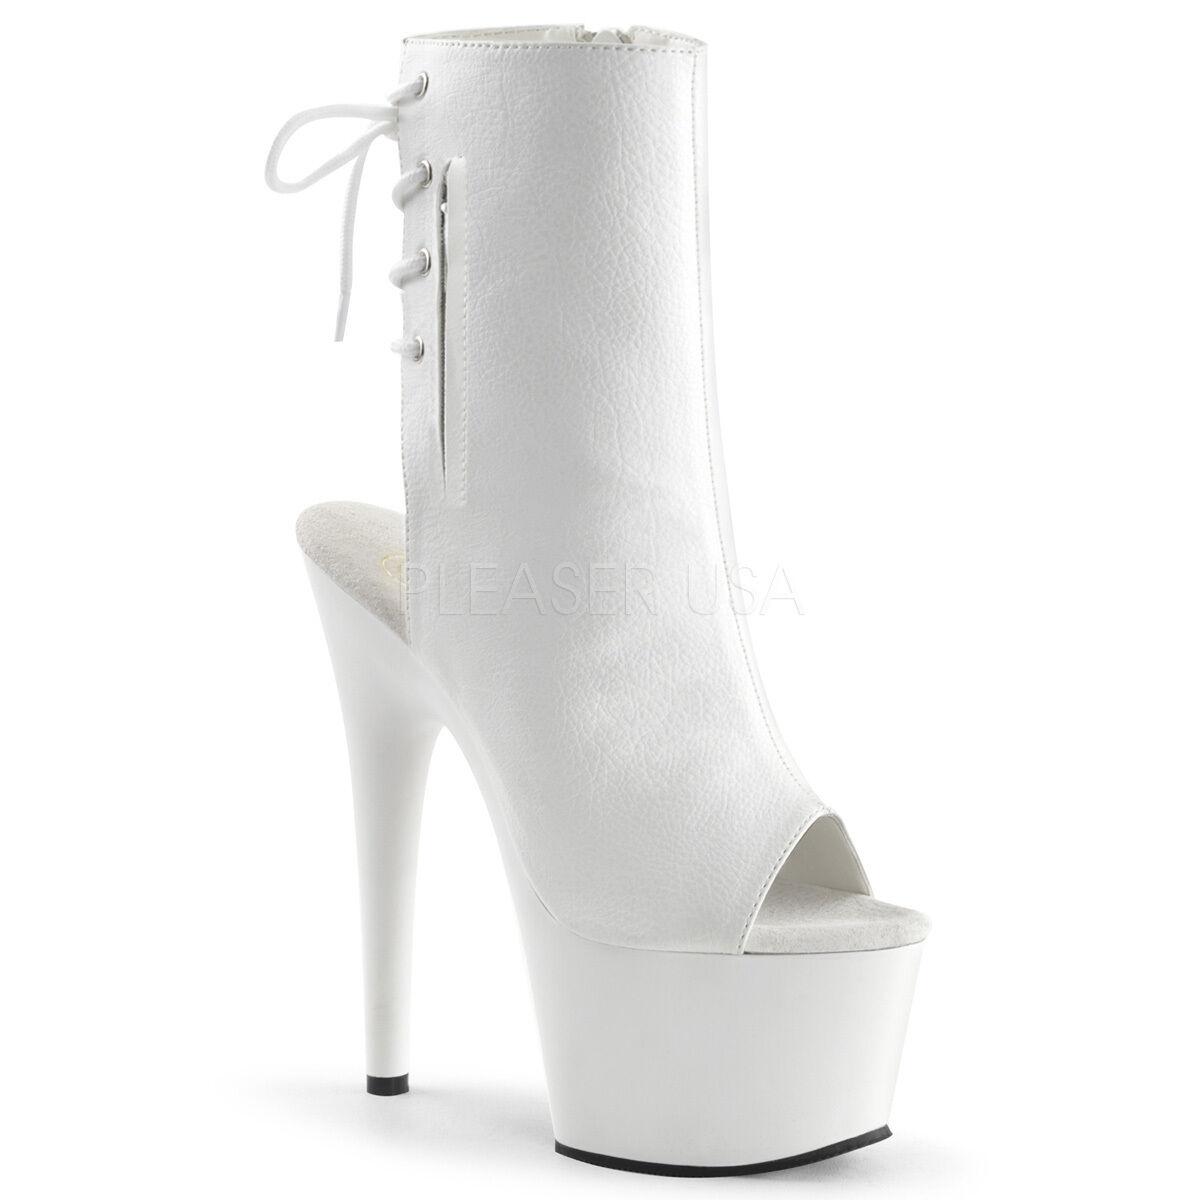 Descuento de liquidación PLEASER - Adore-1018 Peep-Toe Platform Ankle Boots With Side Zips & Back Laces